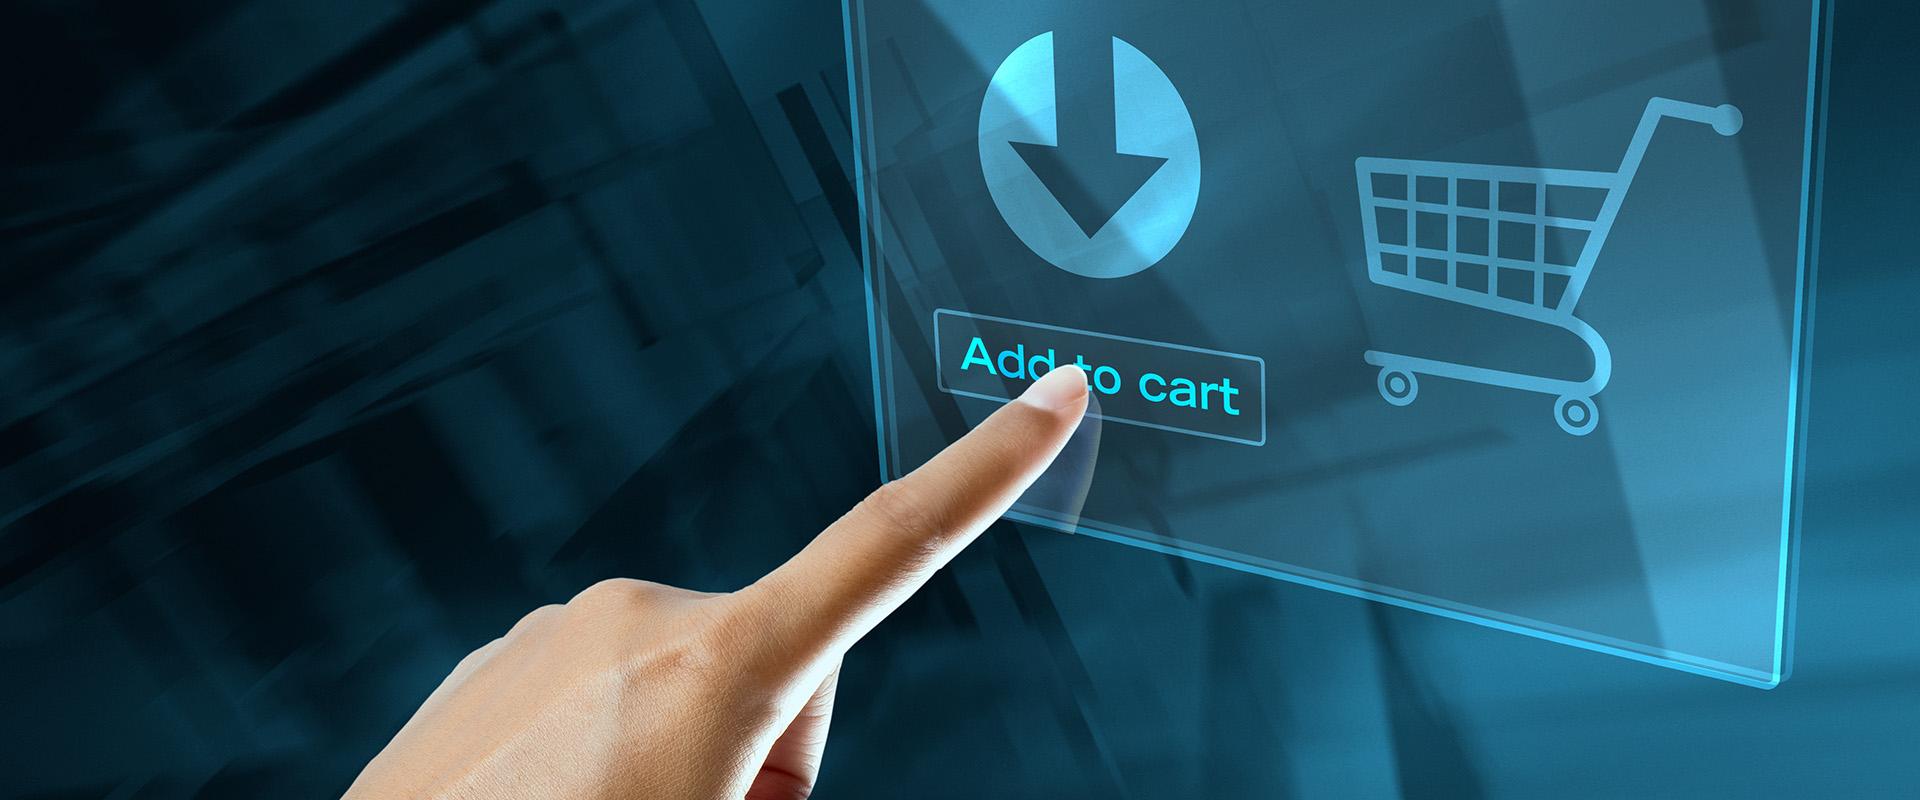 shopping background shopping online cart background image for free download. Black Bedroom Furniture Sets. Home Design Ideas